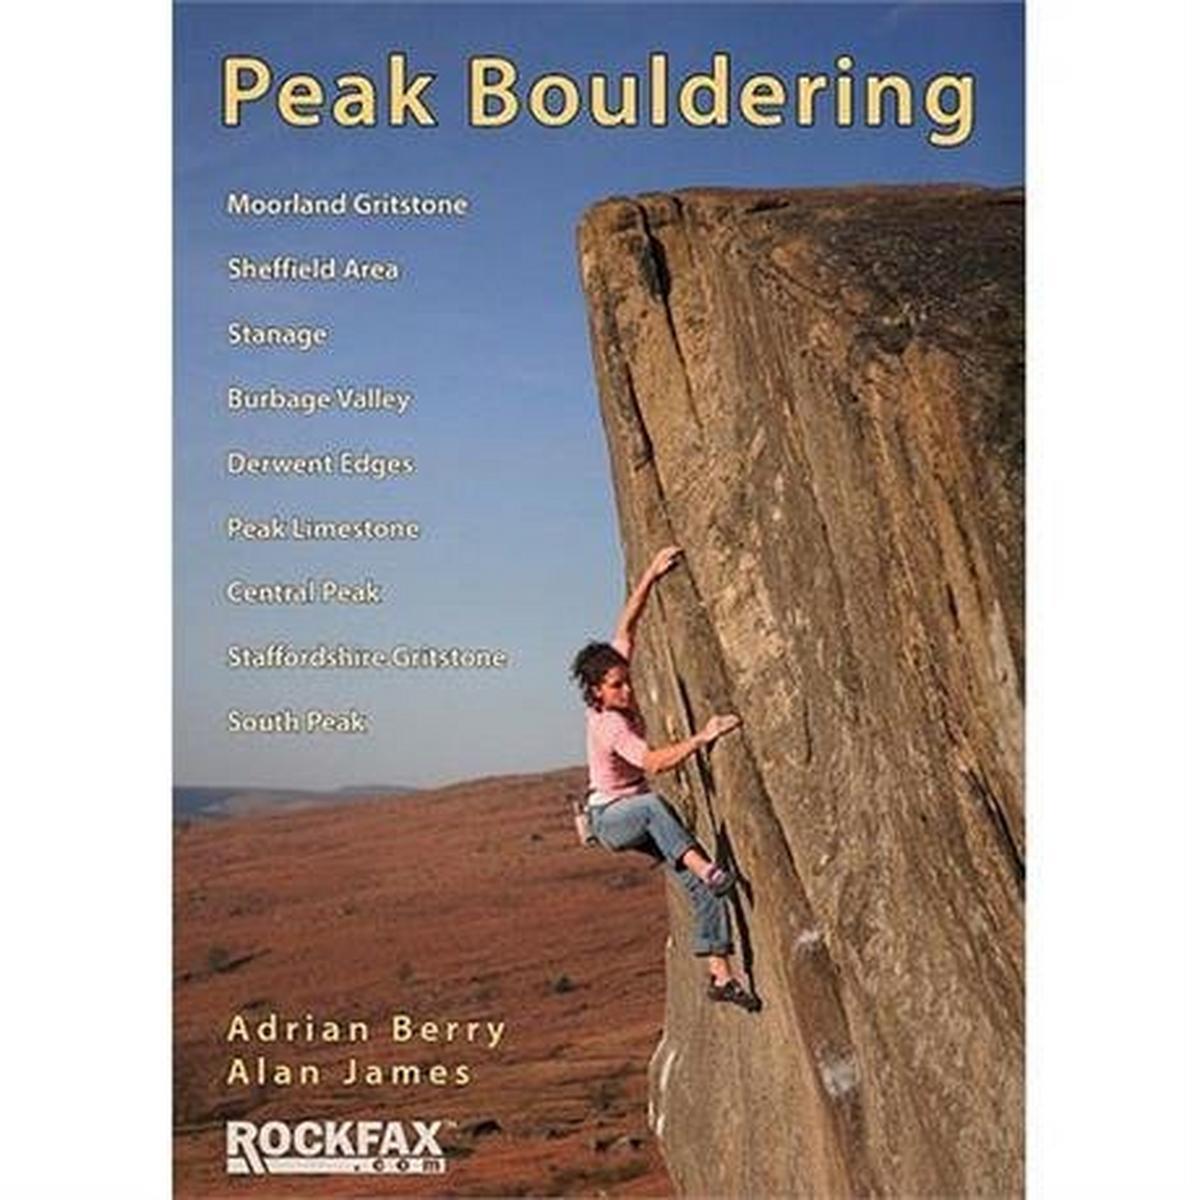 Rockfax Climbing Guide Book: Peak Bouldering